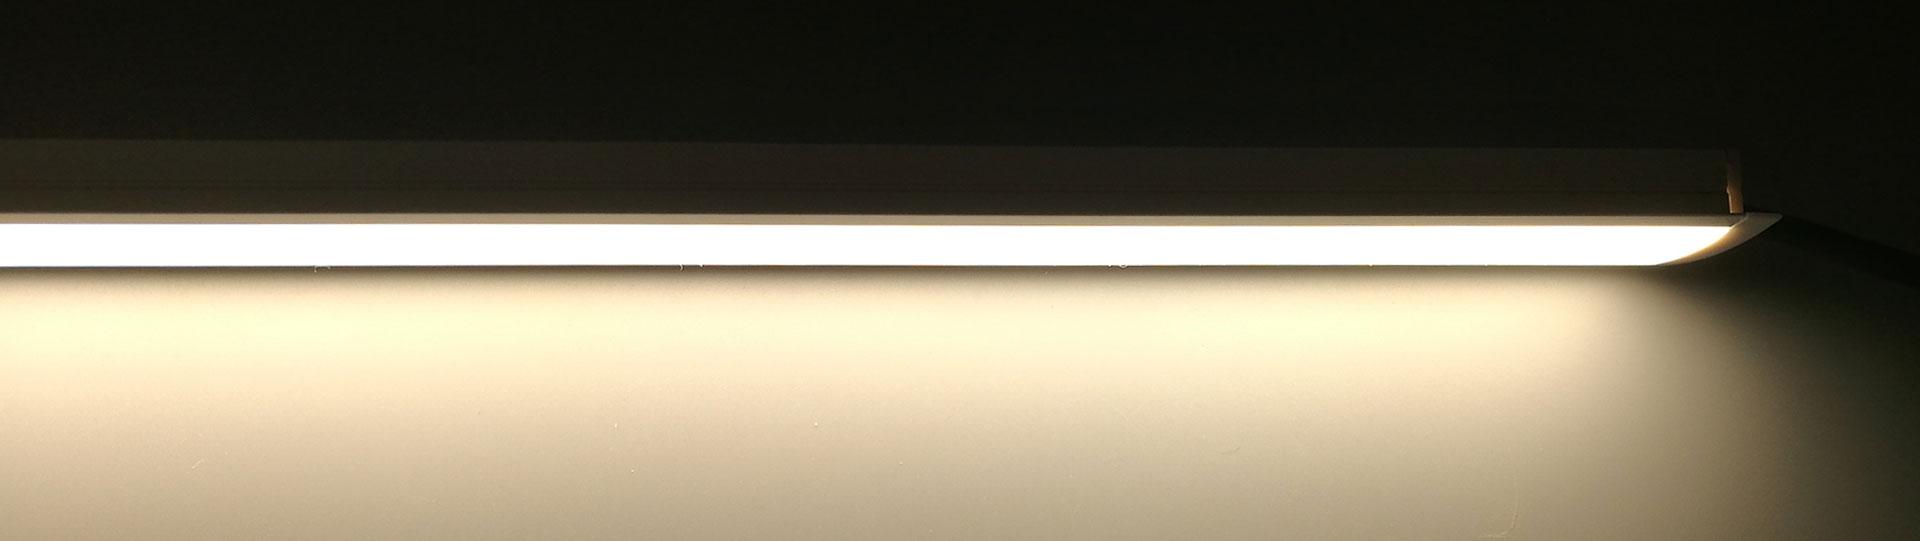 The Color Tolerance of LED Strip Lights